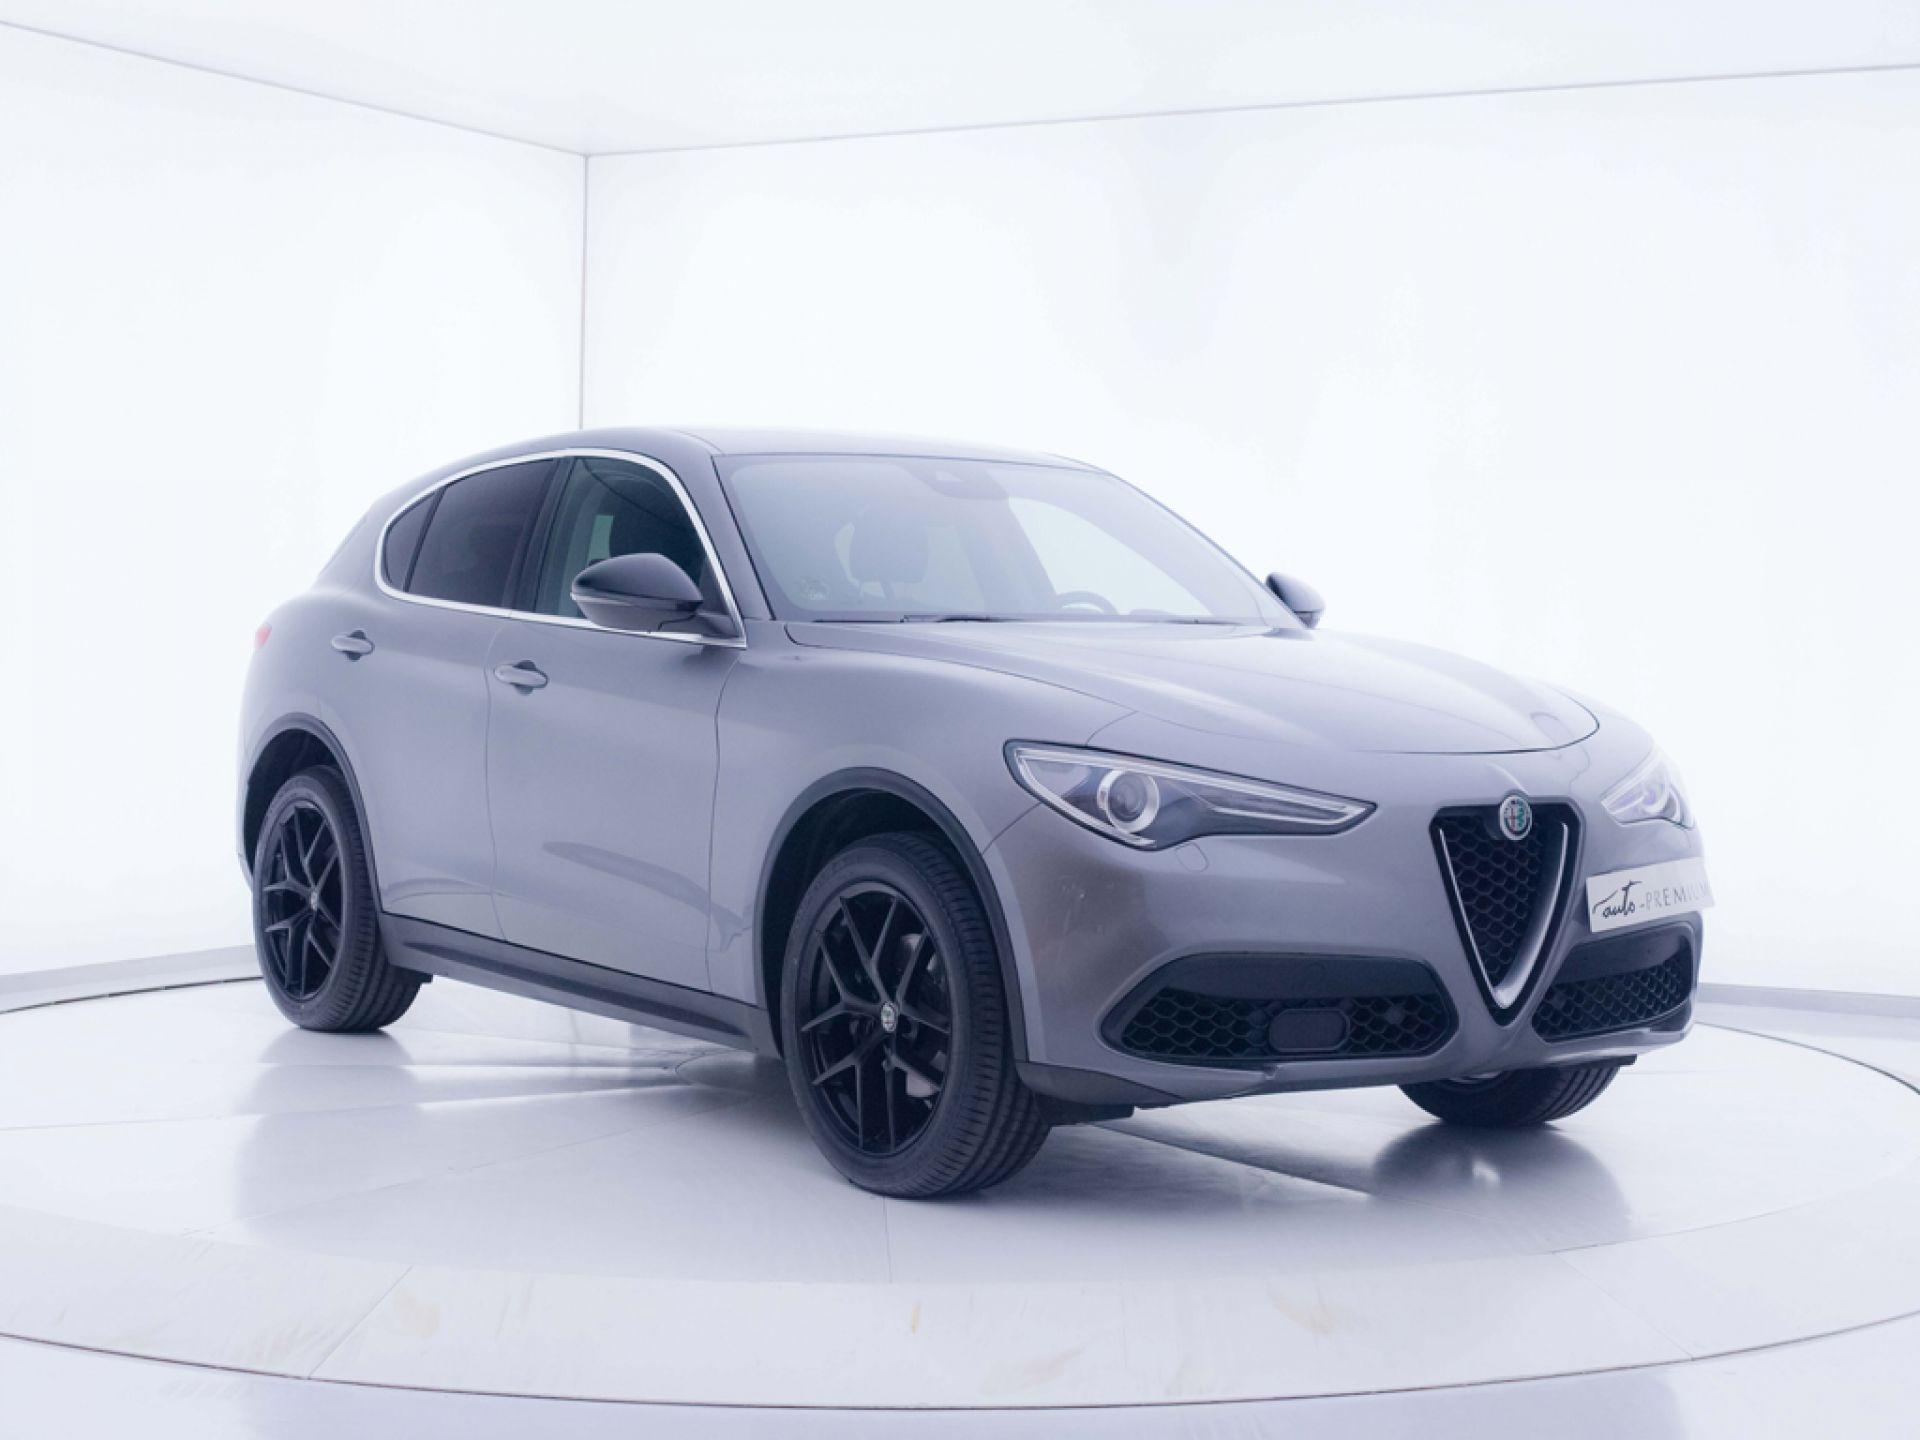 Alfa Romeo Stelvio 2.0 Petrol 206kW (280CV) First Ed.I Q4